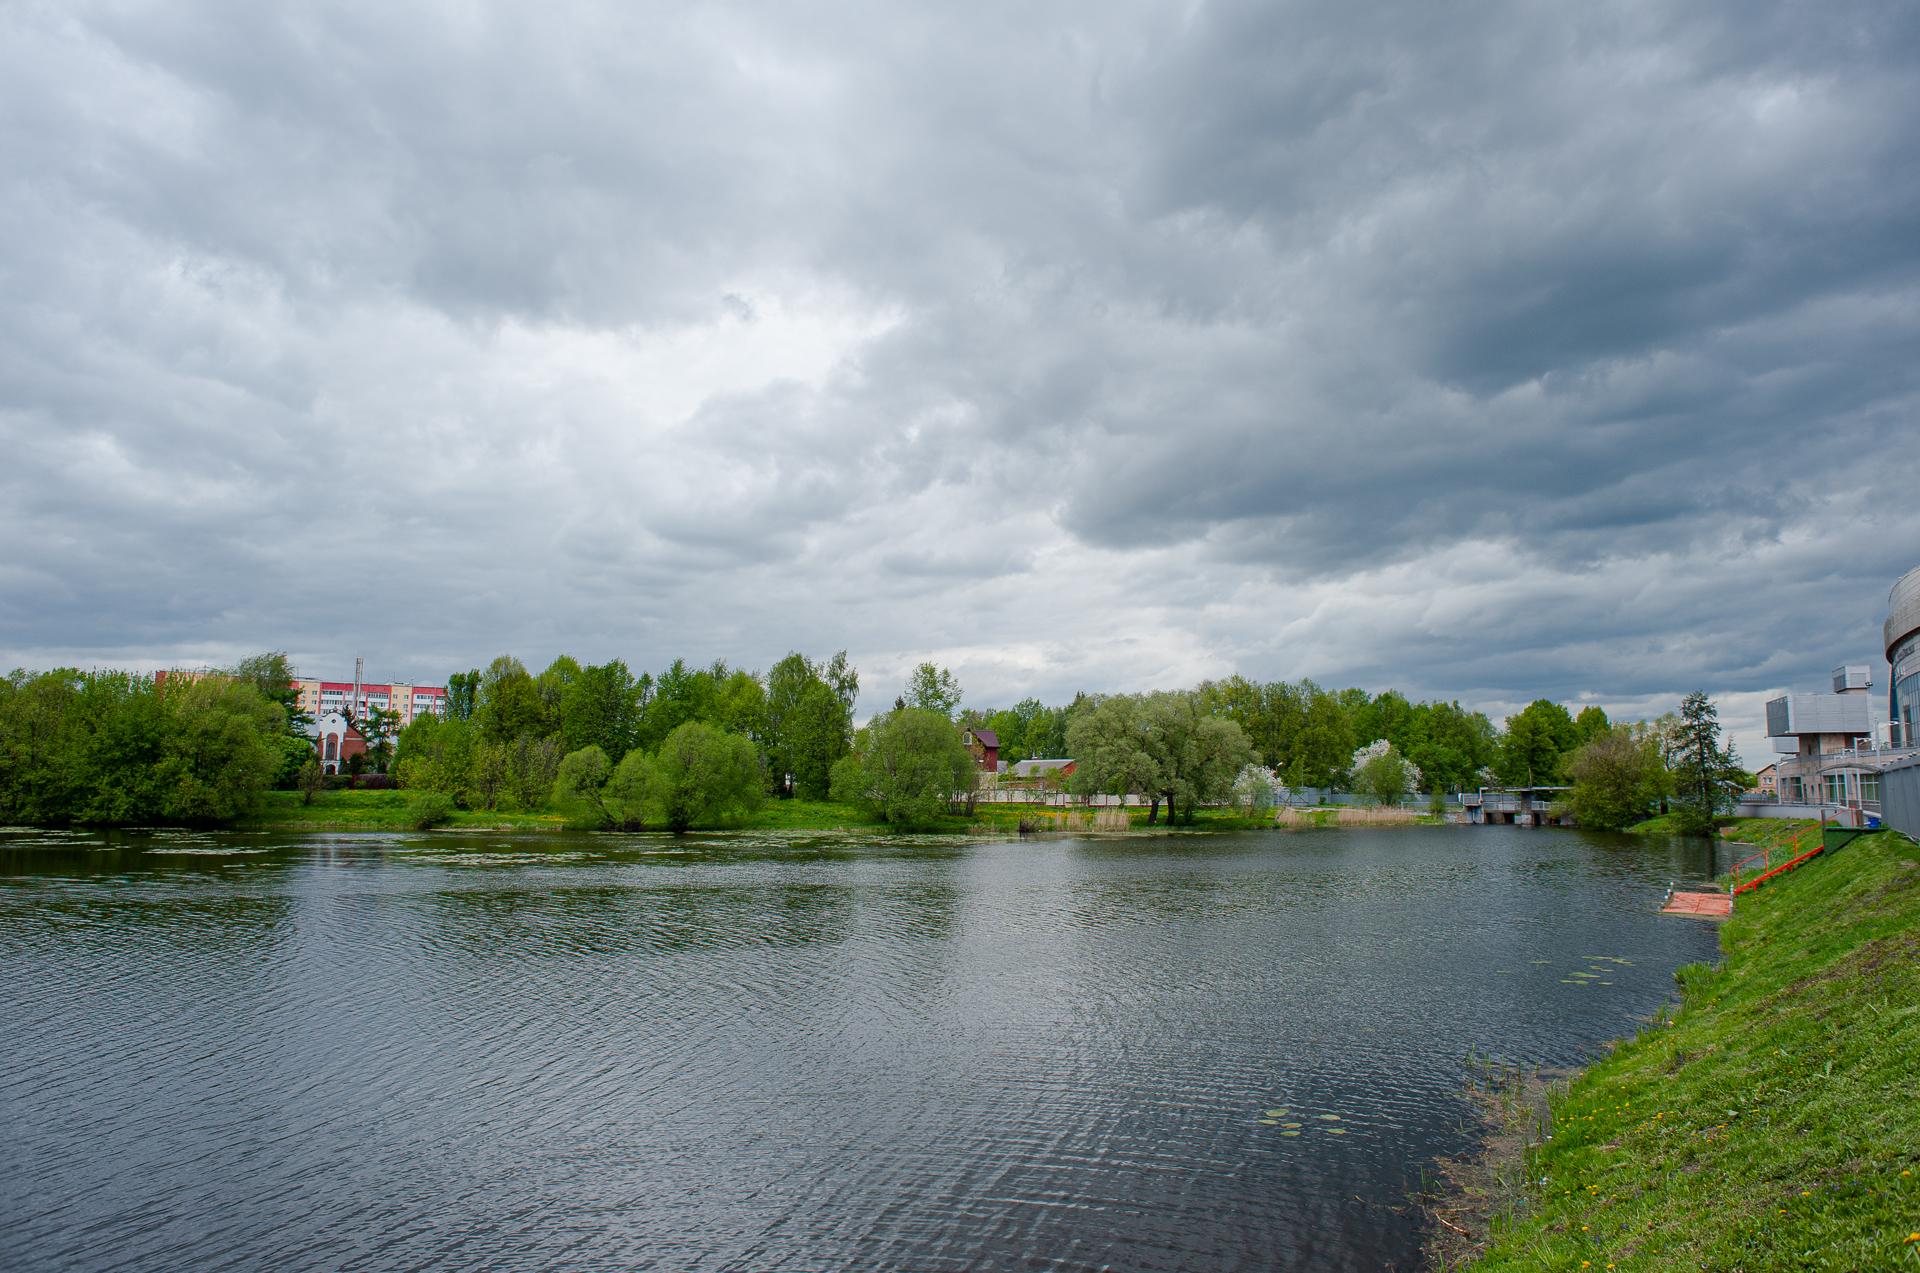 Коломна, Коломенский Кремль, река Коломна